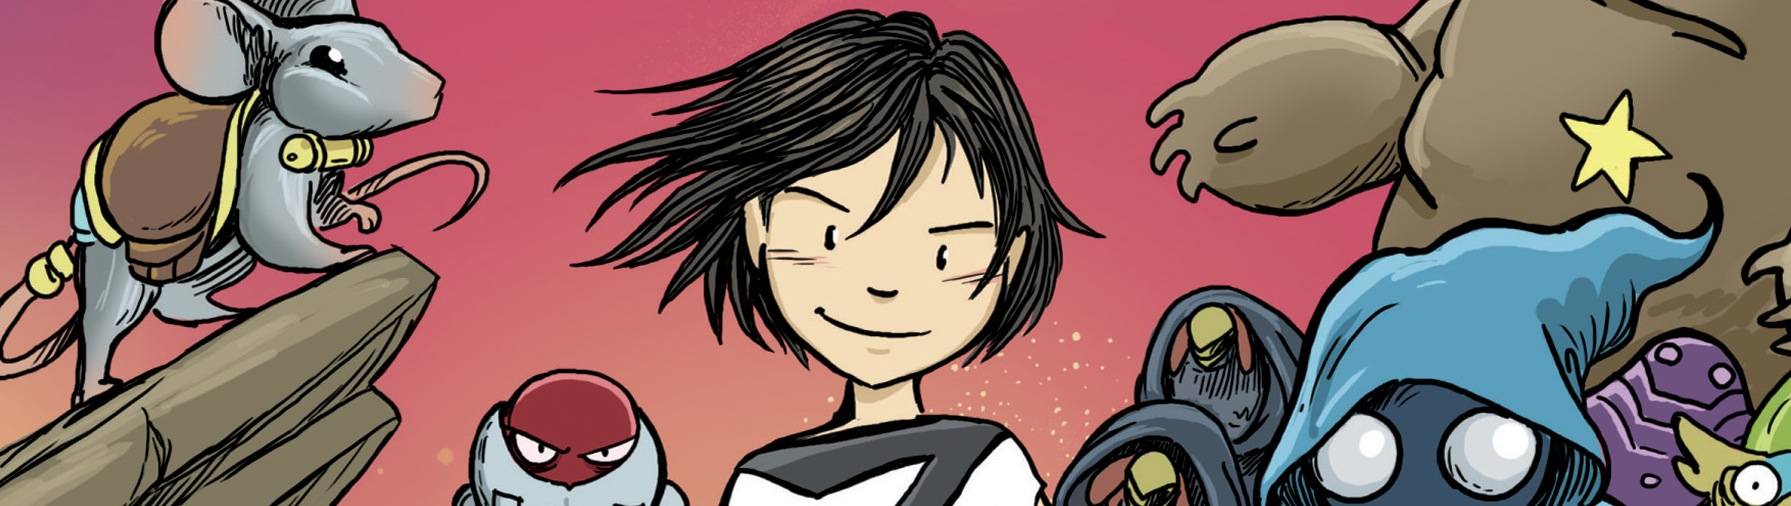 Review: The Return of Zita the Spacegirl